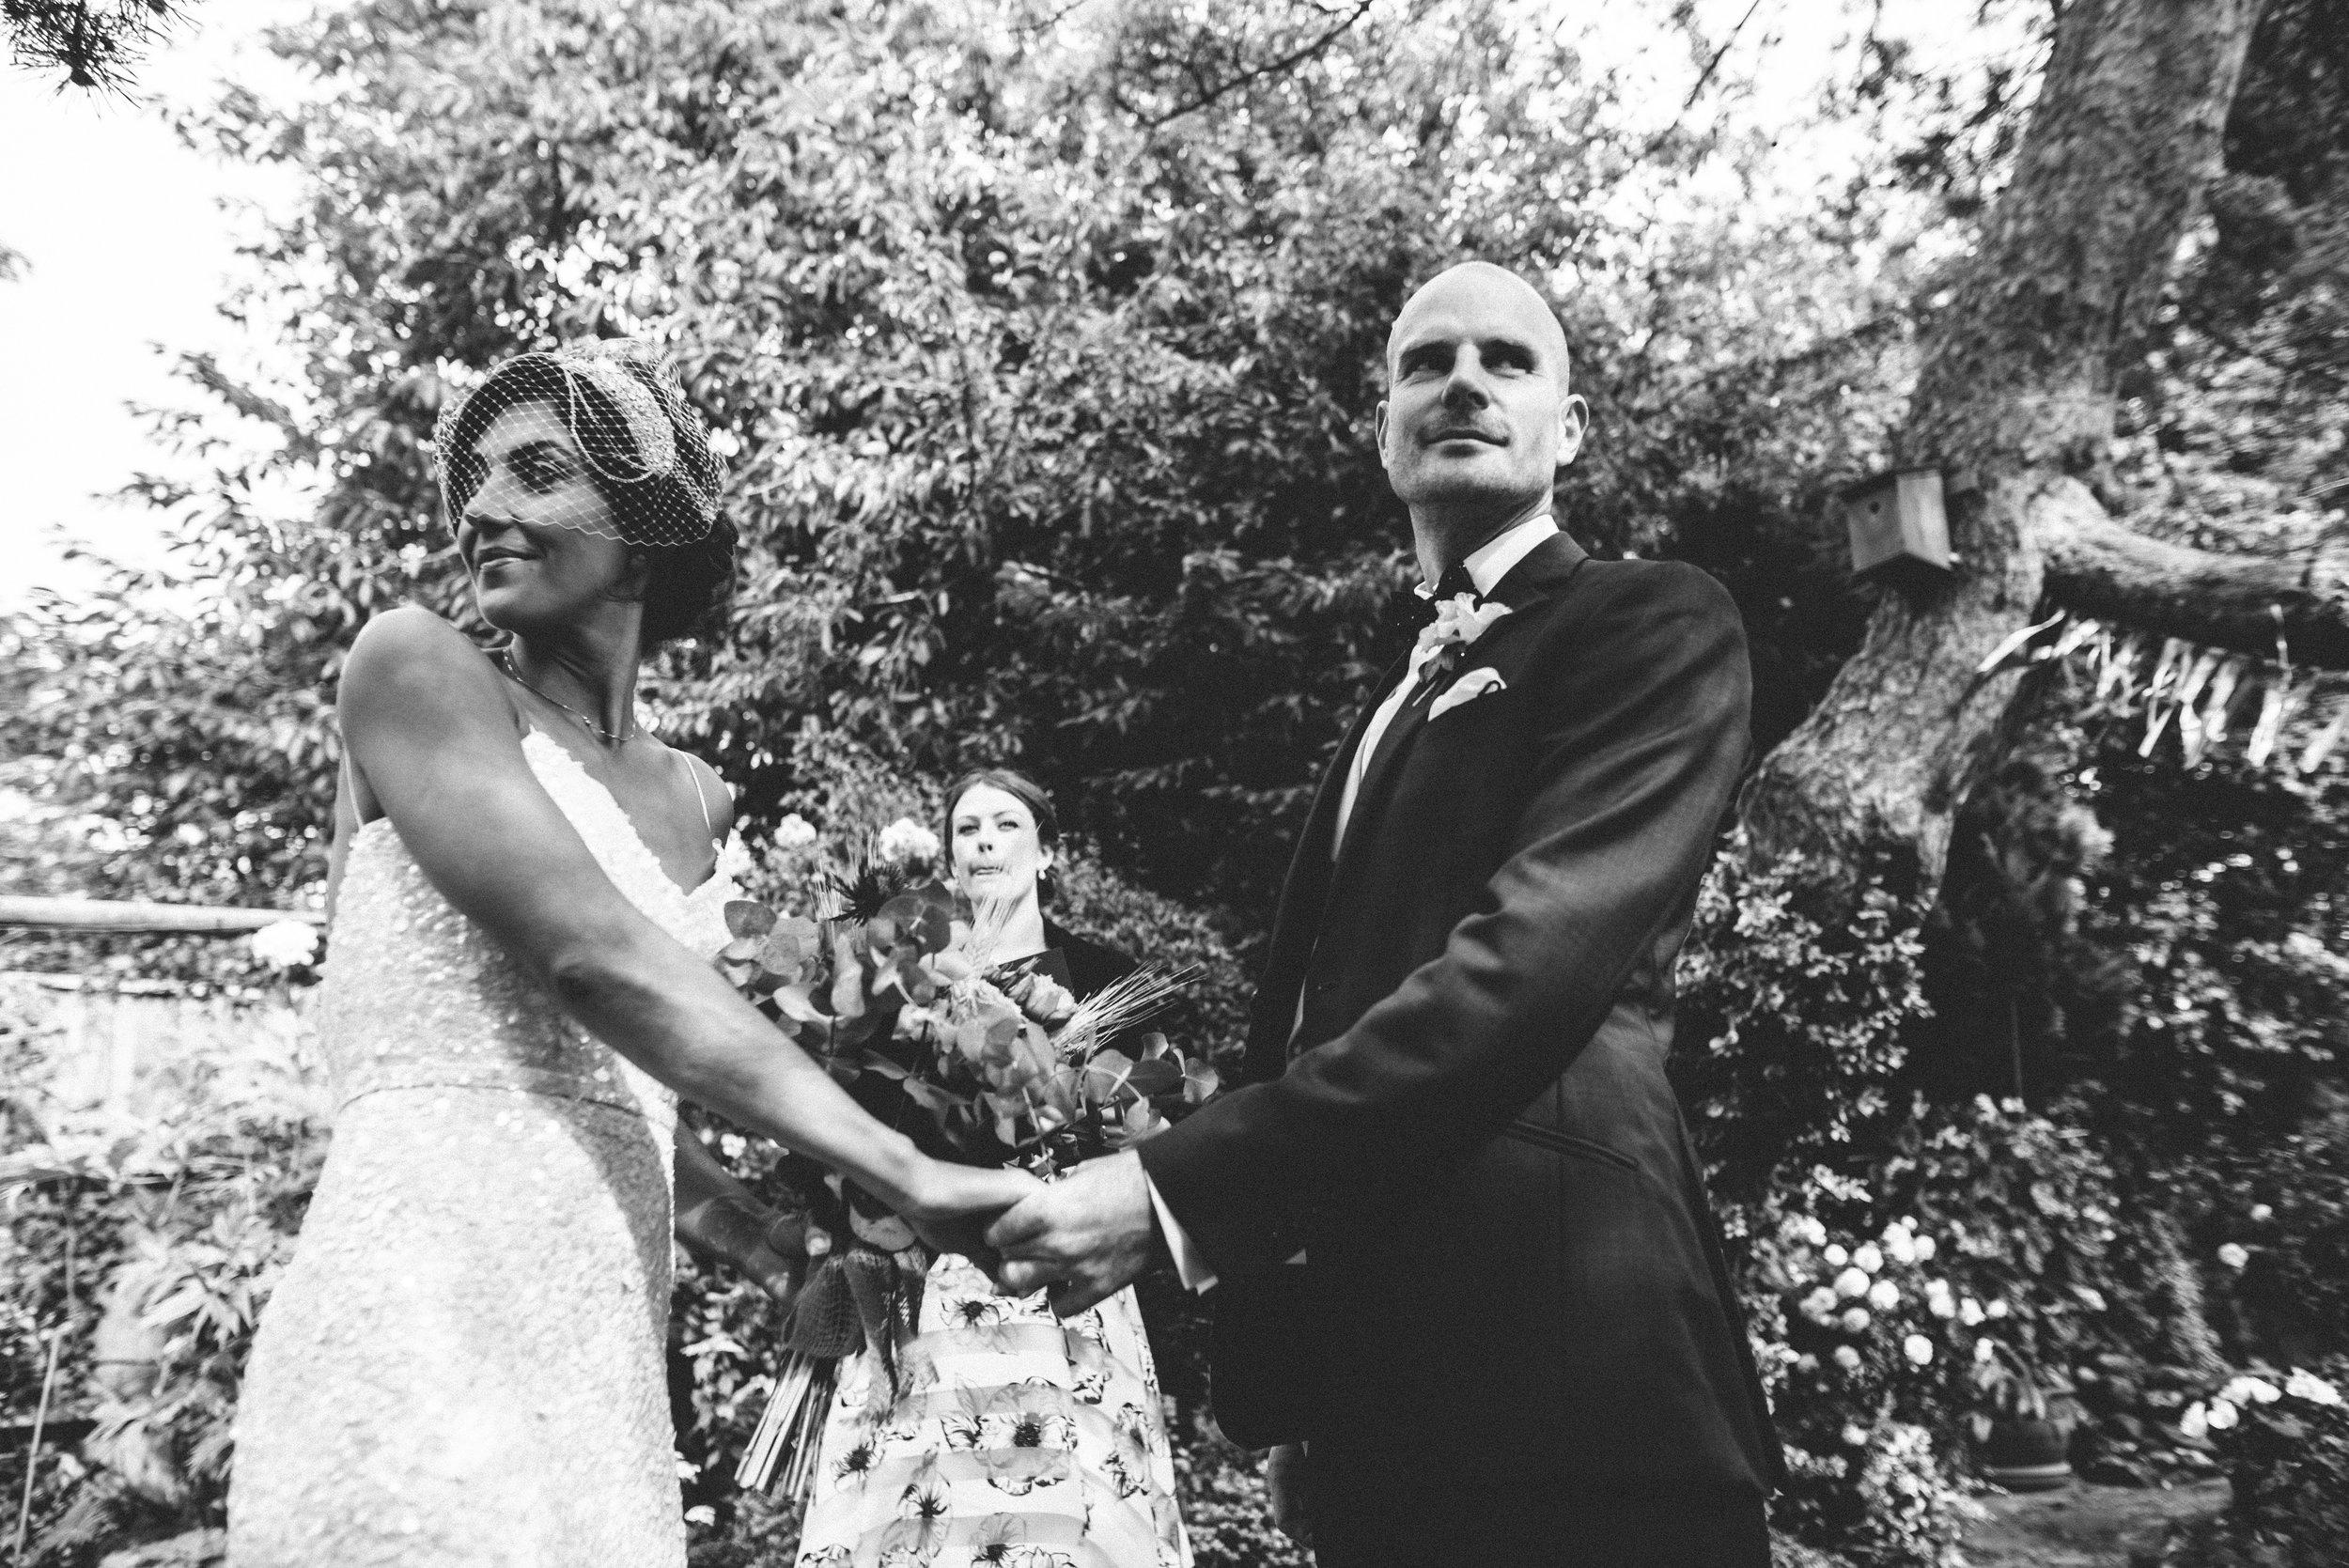 Garden Wedding photography Barley Herefordshire - Tracy + Matt -159.jpg